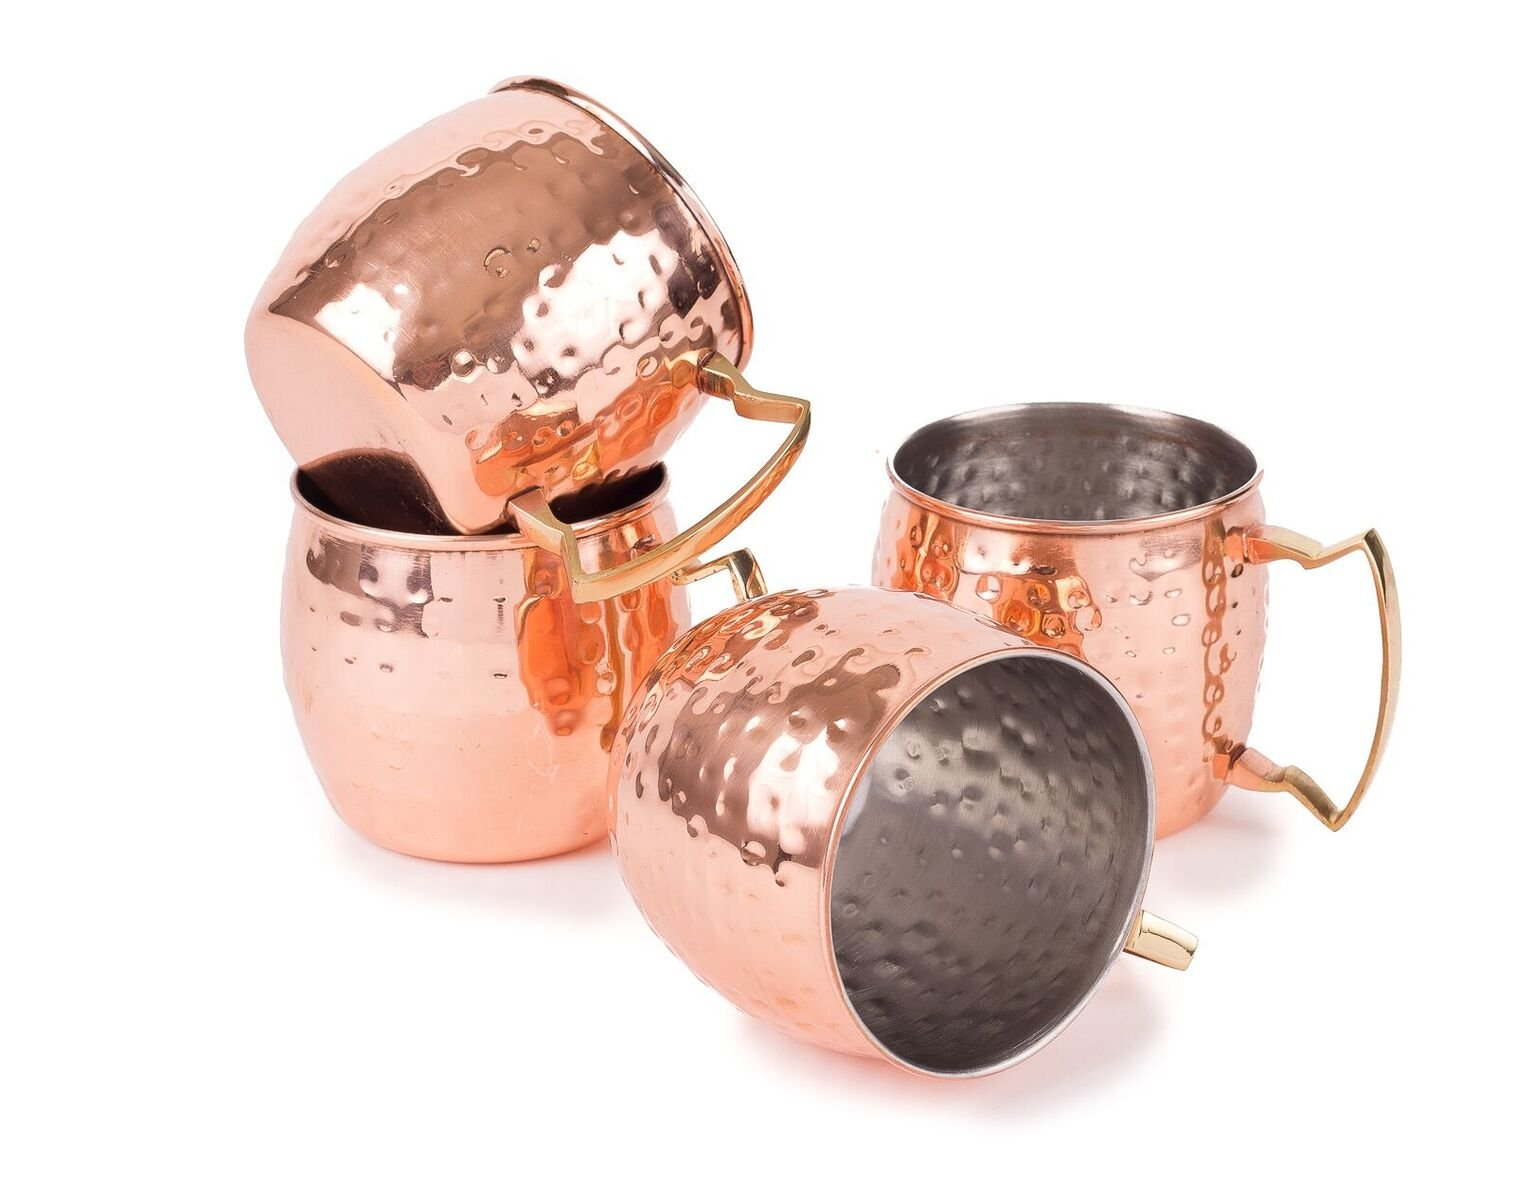 Dozenegg Stainless Steel Copper Moscow Mug 16 Oz Capacity Set of 4